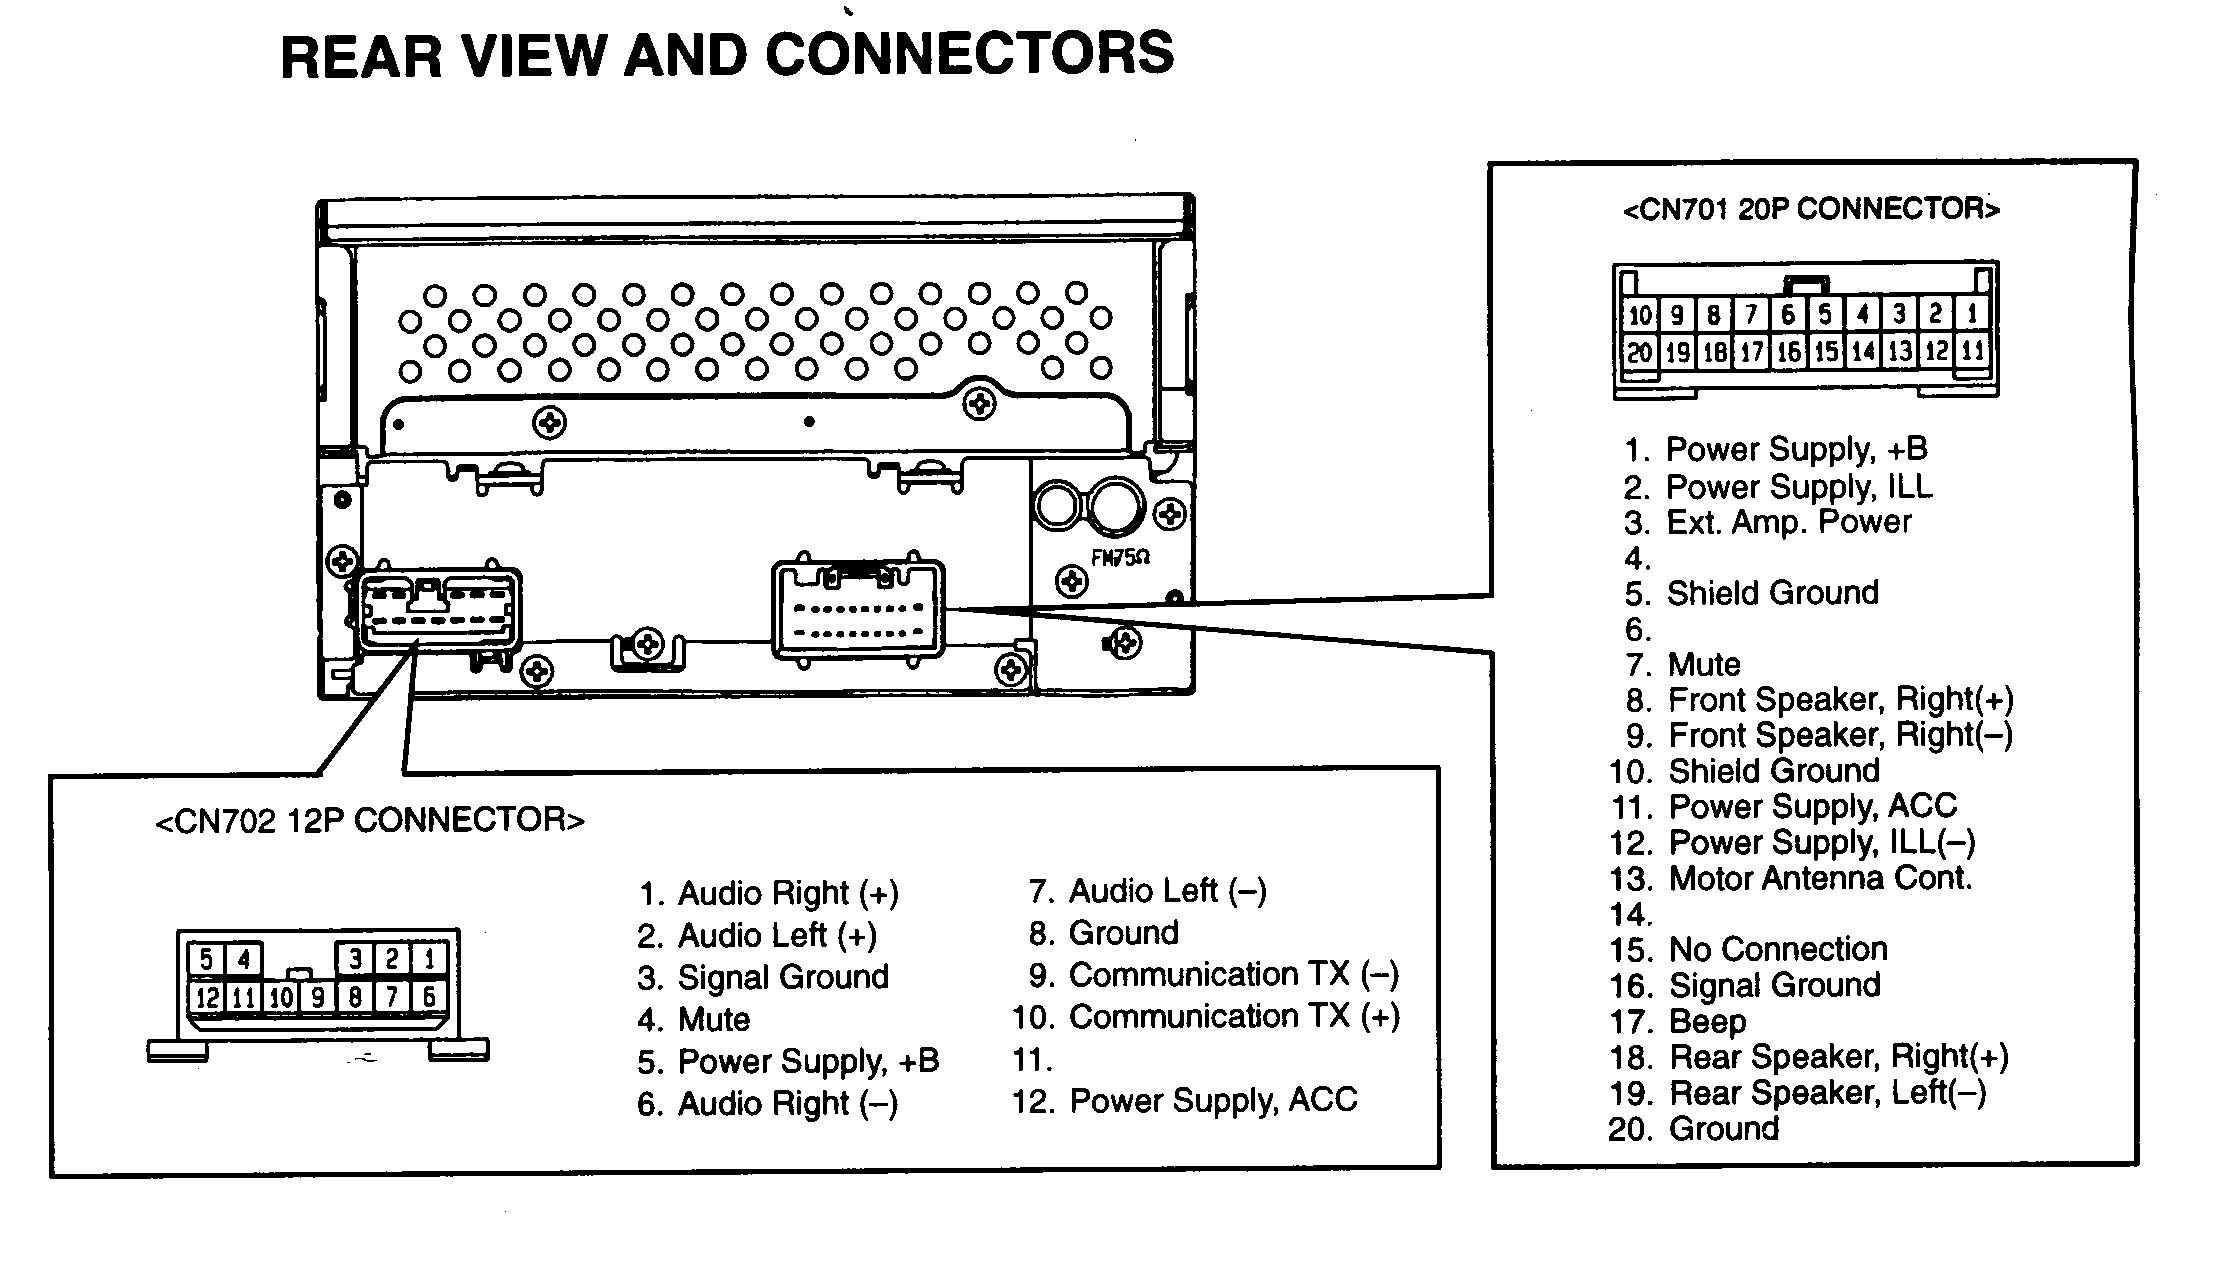 Tremendous Panasonic Car Stereo Harness Wiring Diagram Data Schema Wiring Cloud Ymoonsalvmohammedshrineorg